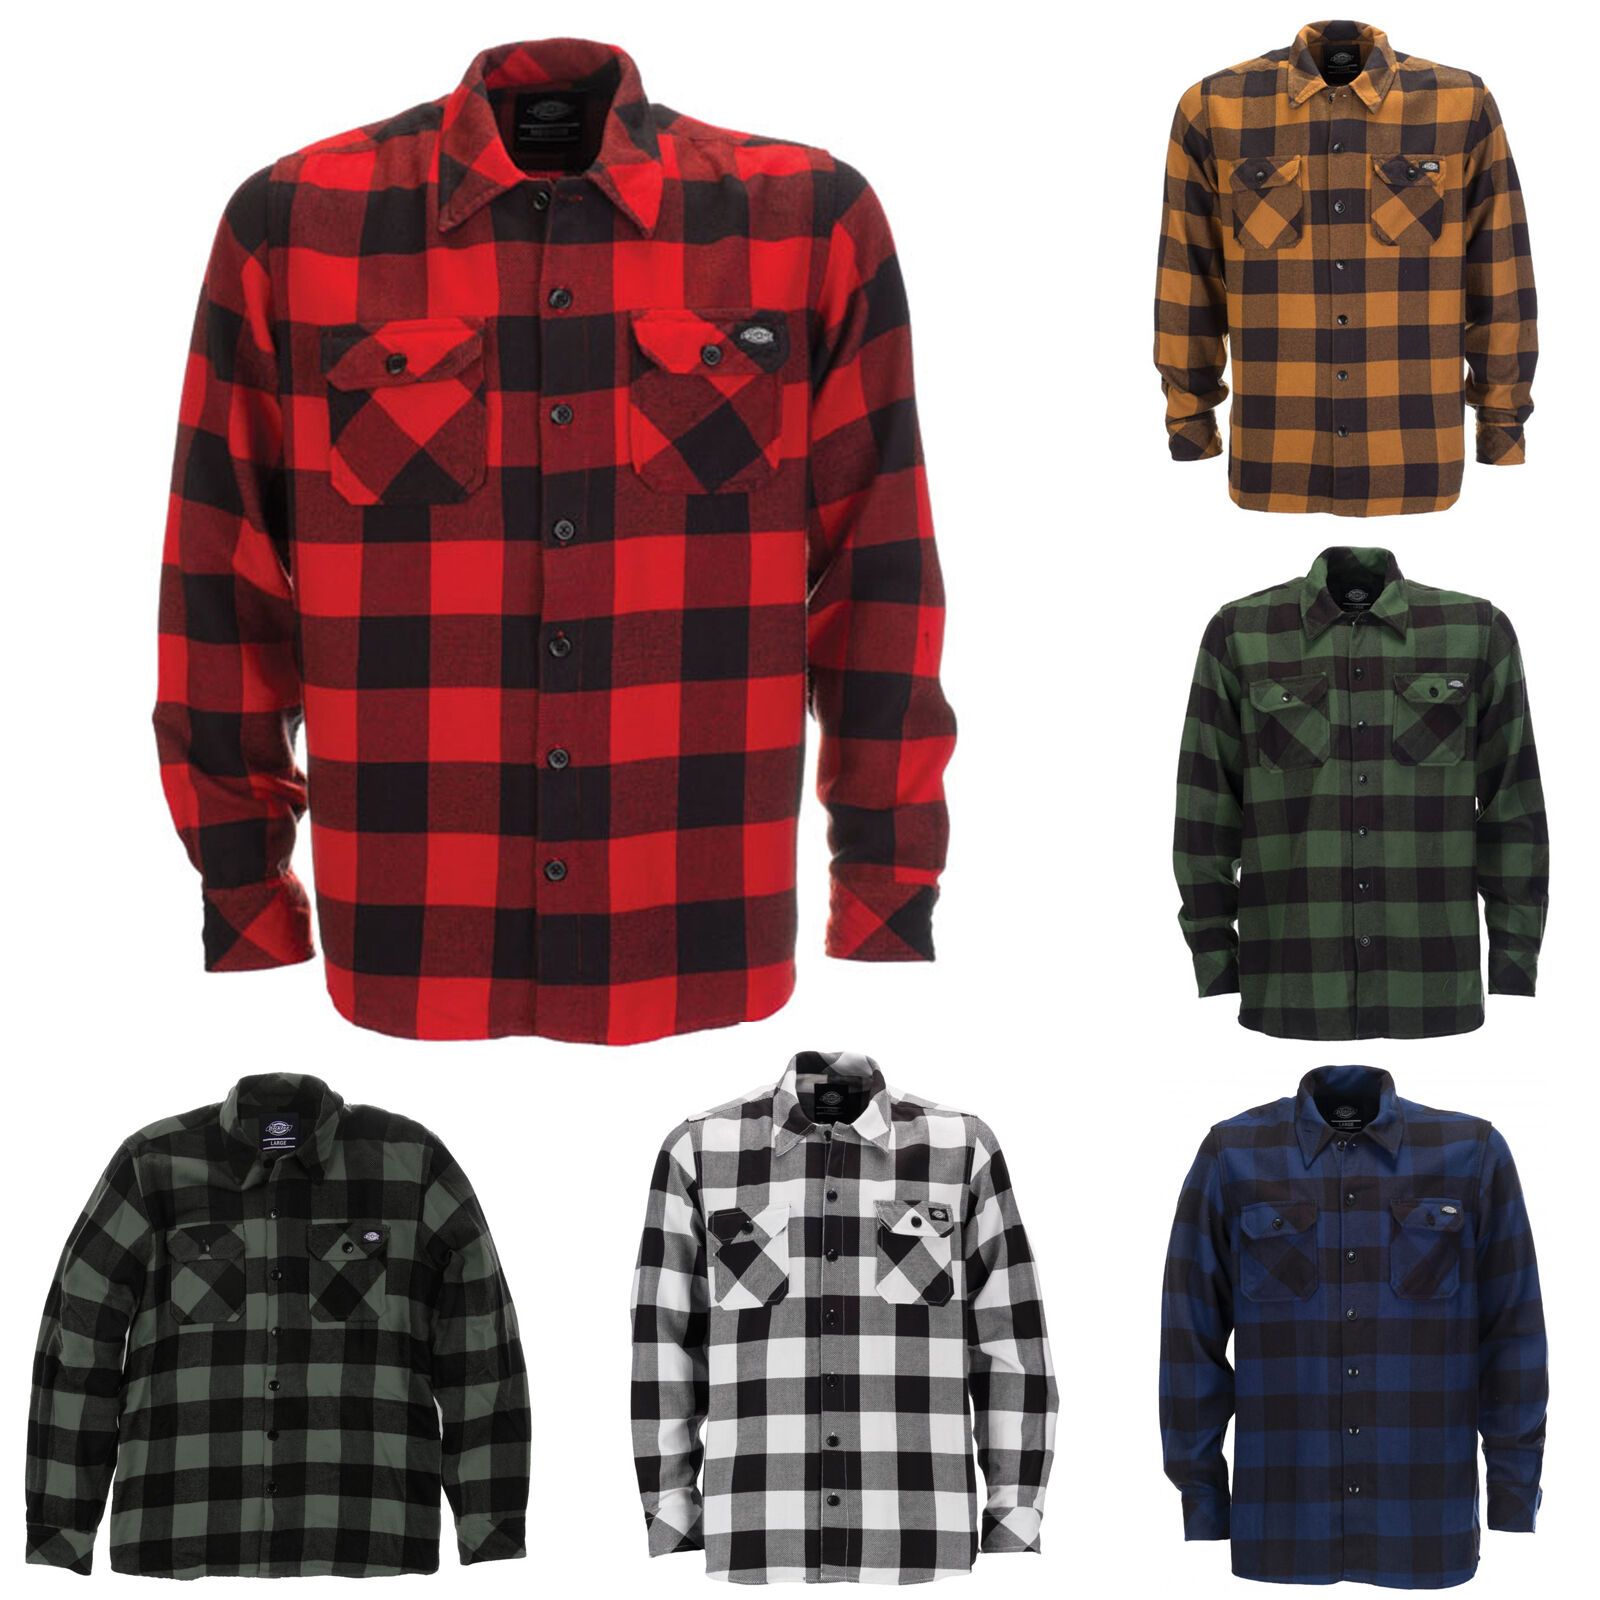 Dickies - Sacramento Karohemd Holzfeller Kariert Hemden Herren